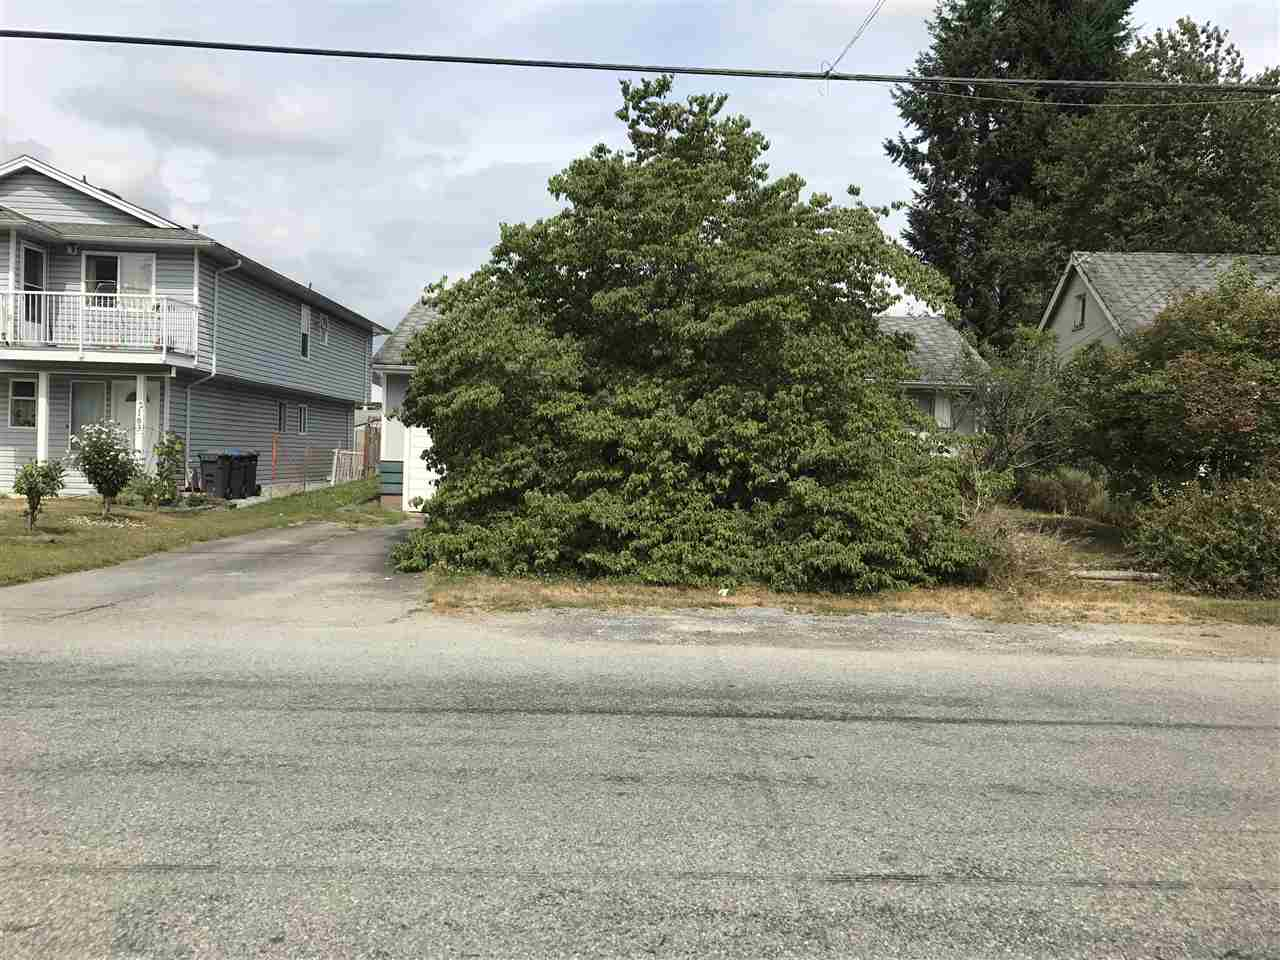 Detached at 2159 FRASER AVENUE, Port Coquitlam, British Columbia. Image 1